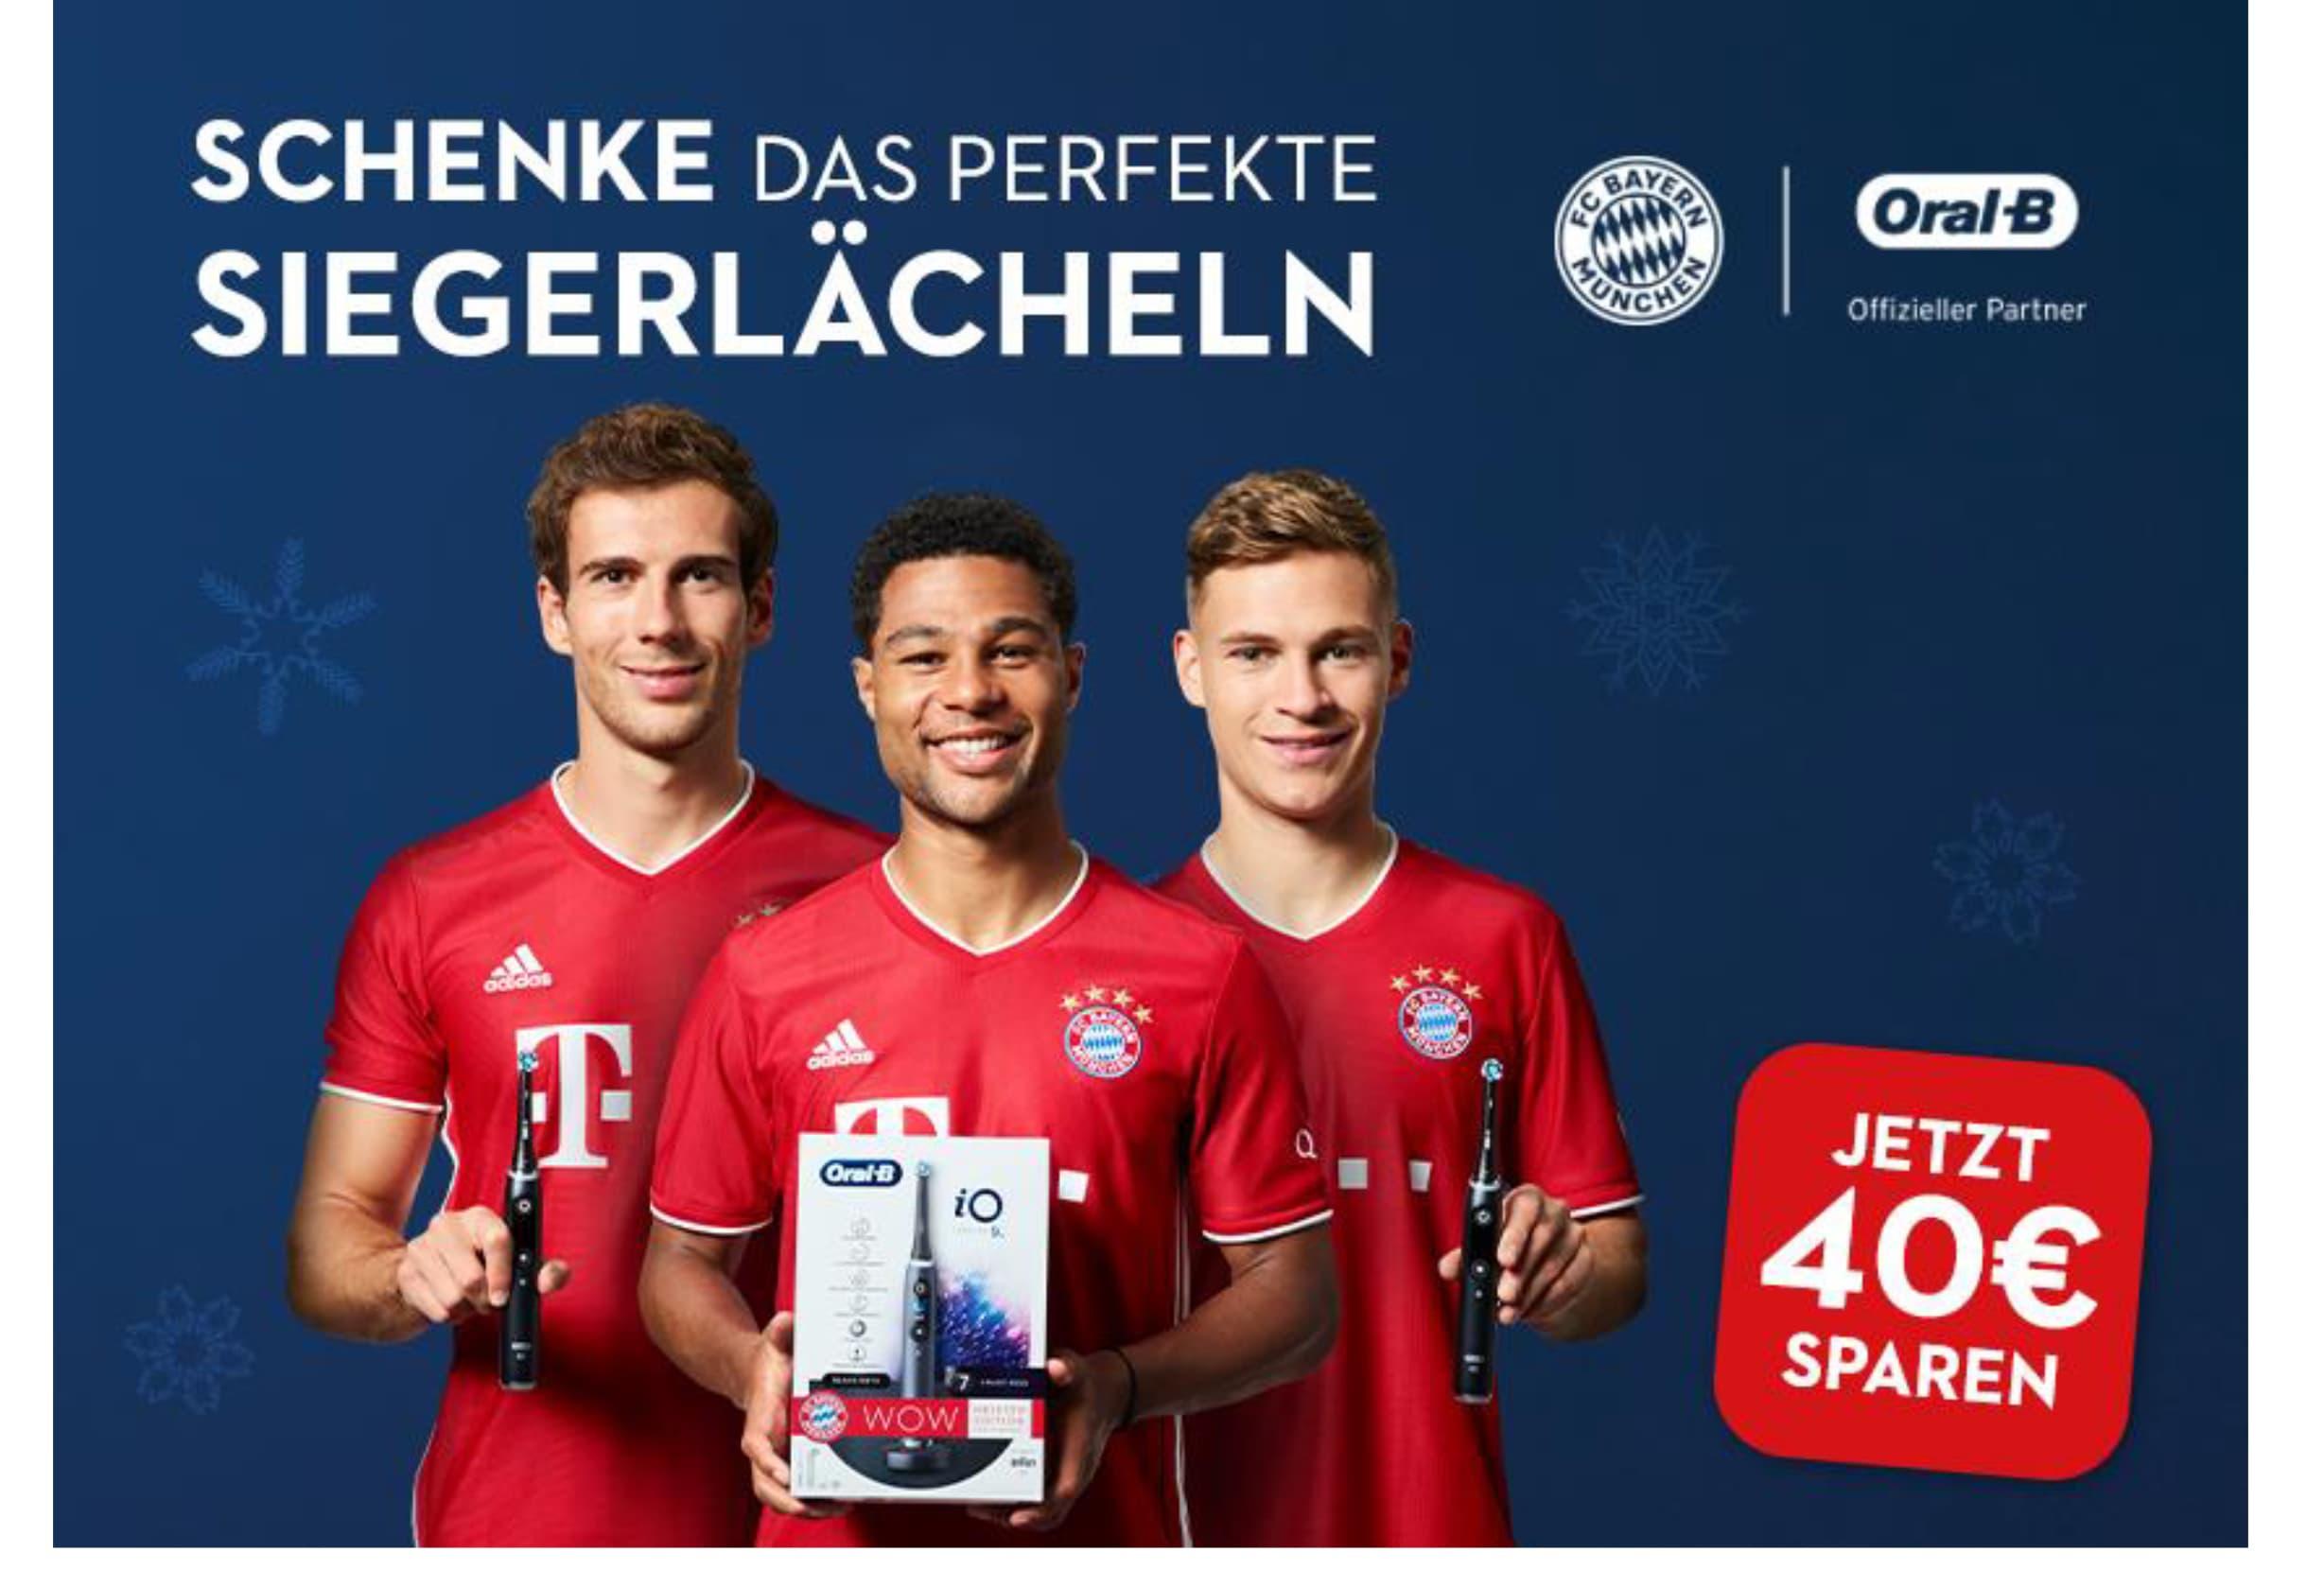 Oral-B WOW COUPON - FC Bayern Spieler